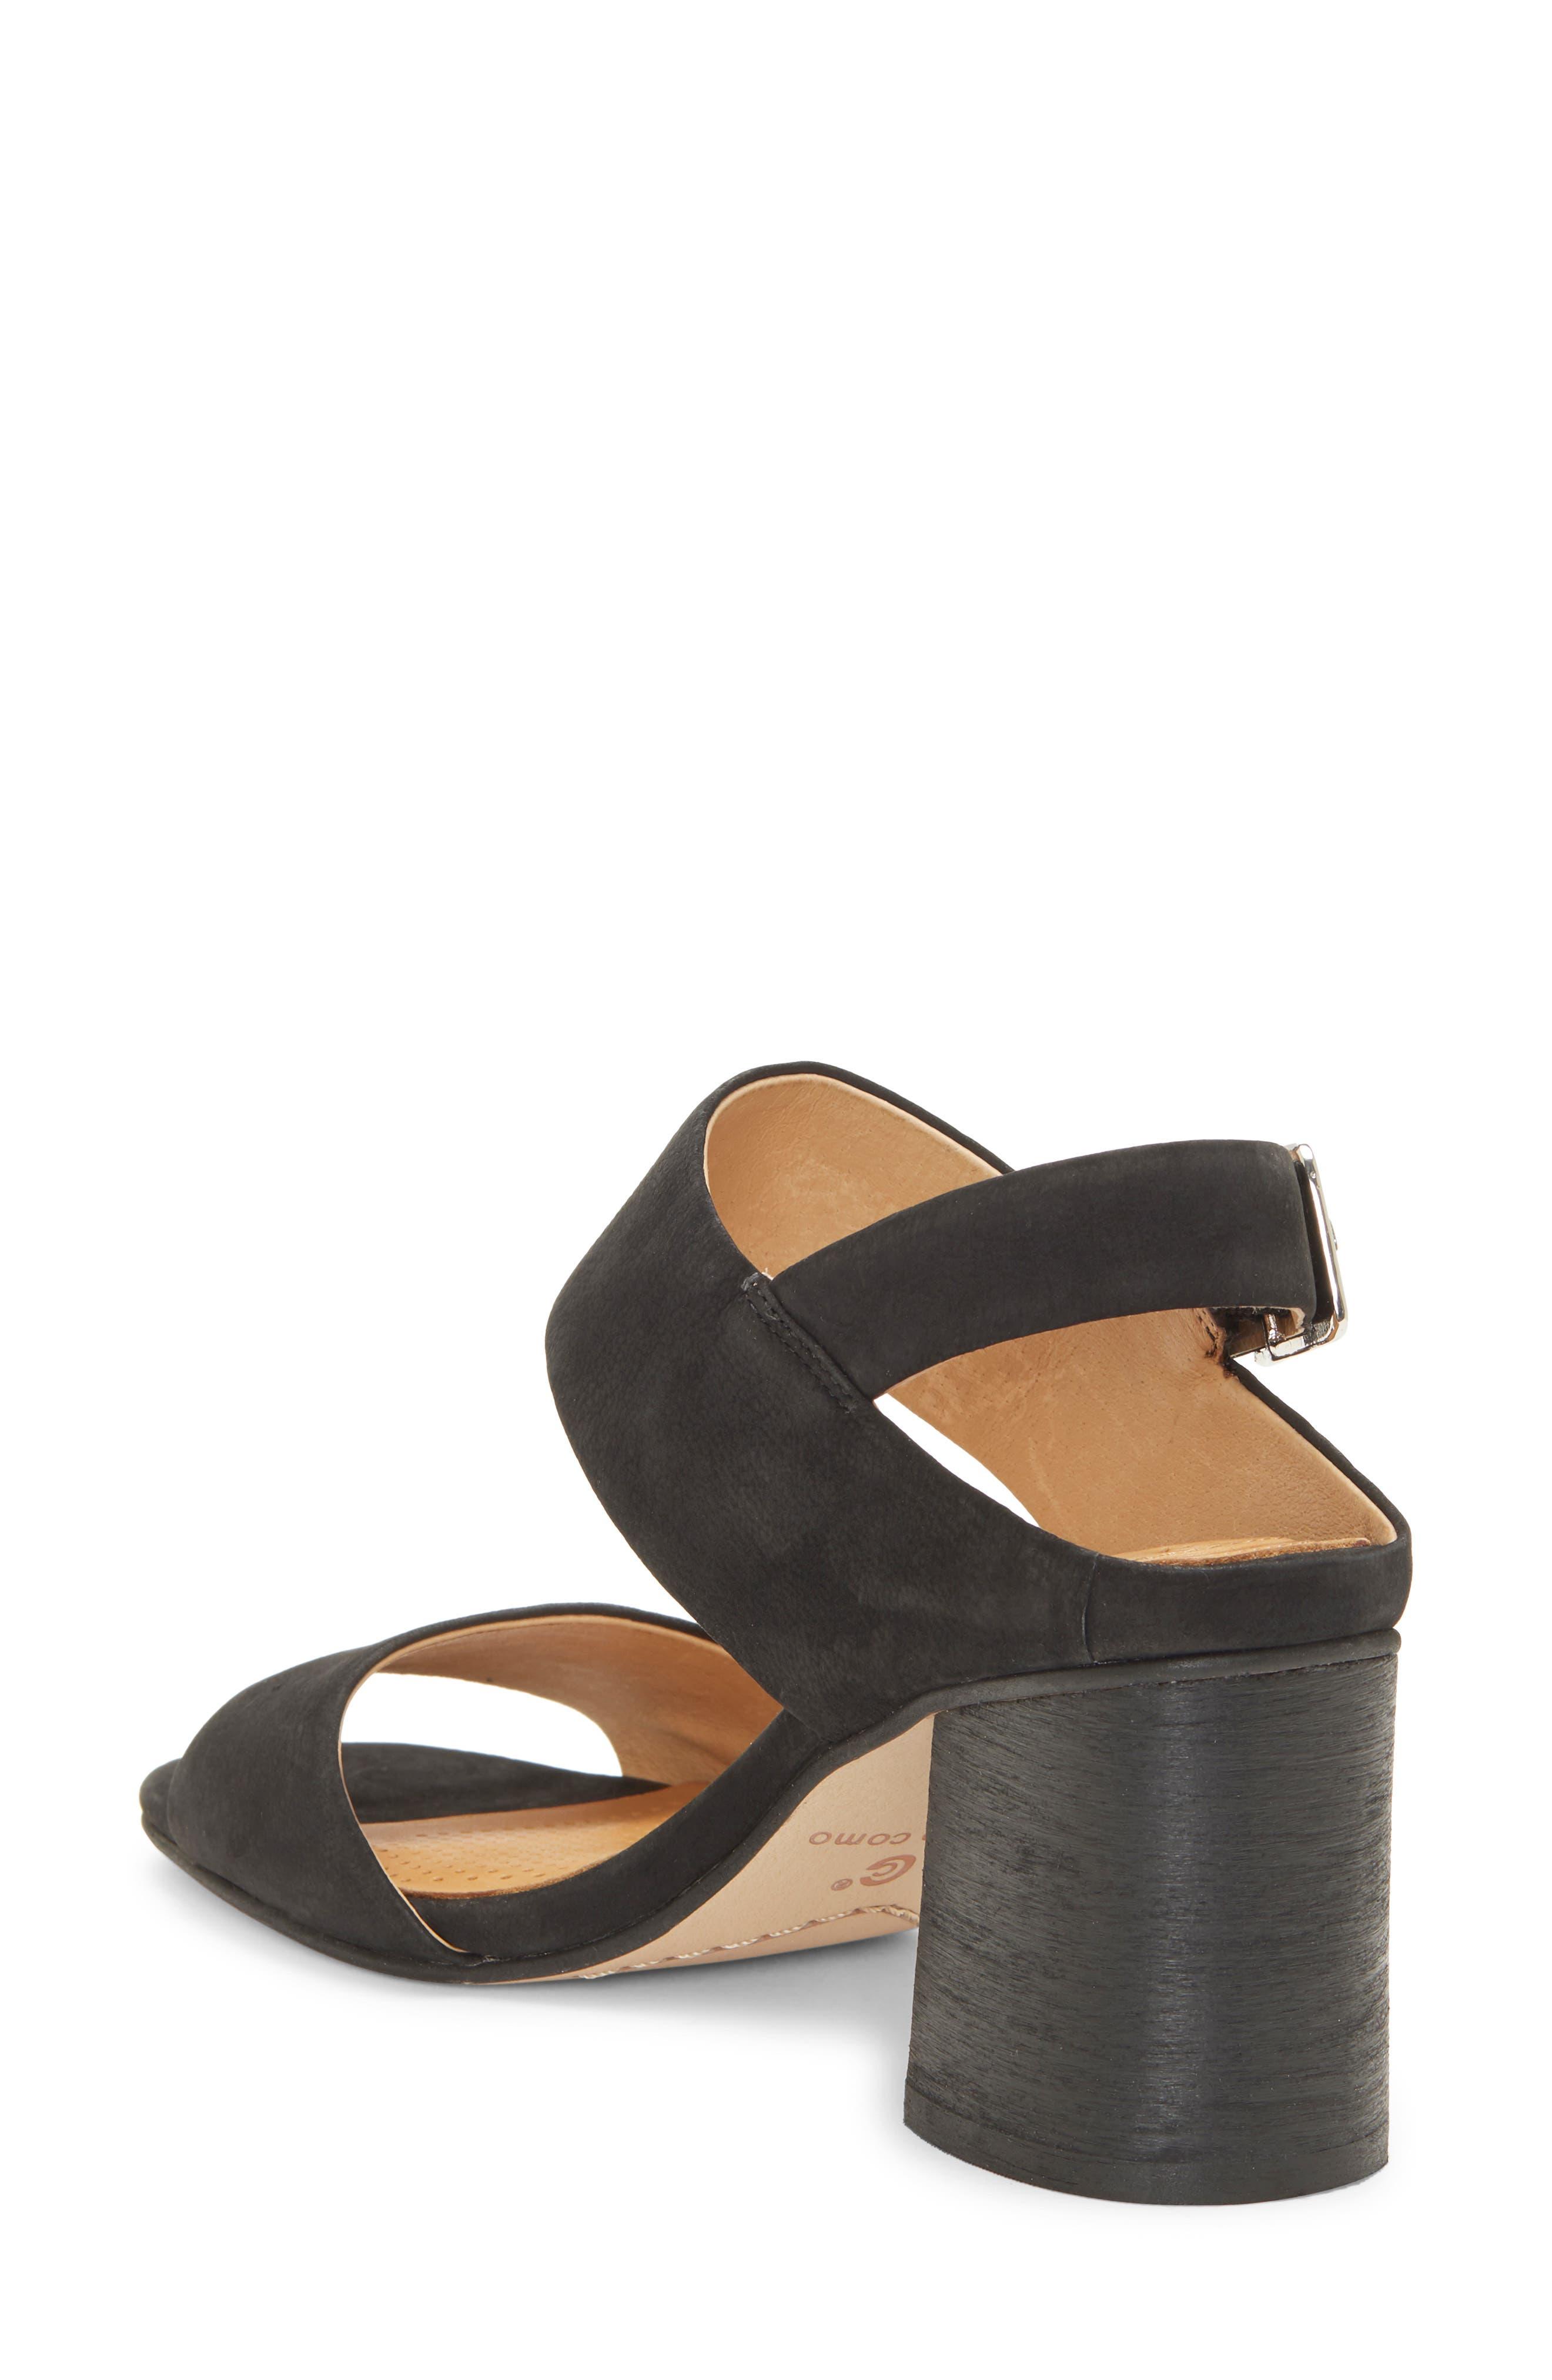 CC CORSO COMO<SUP>®</SUP>,                             CC Corso Como Prysm Block Heel Sandal,                             Alternate thumbnail 2, color,                             BLACK LEATHER